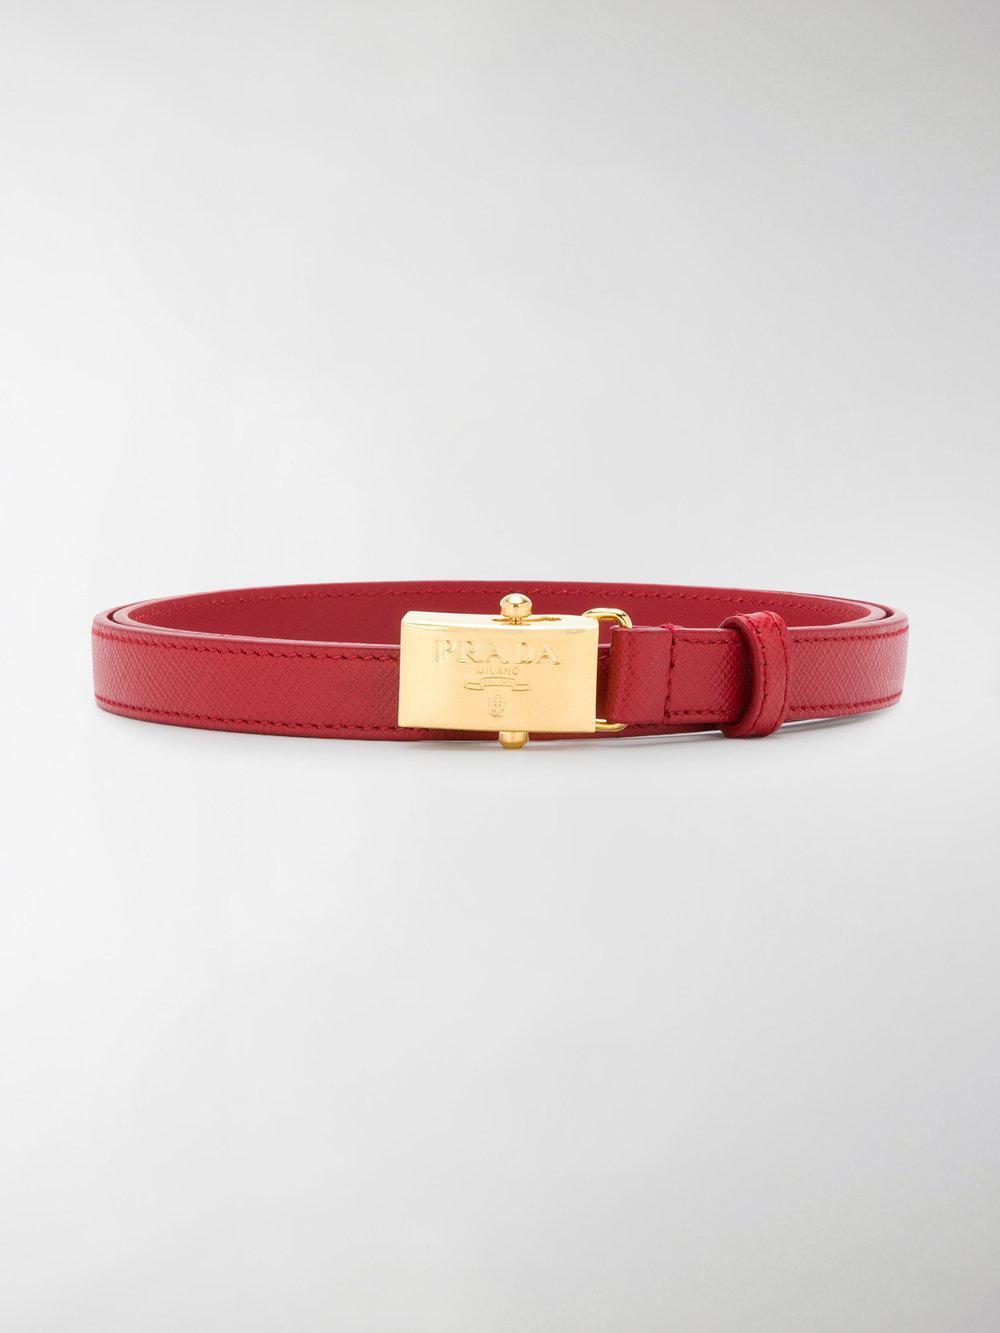 logo plaque belt - Red Prada K0mLoB